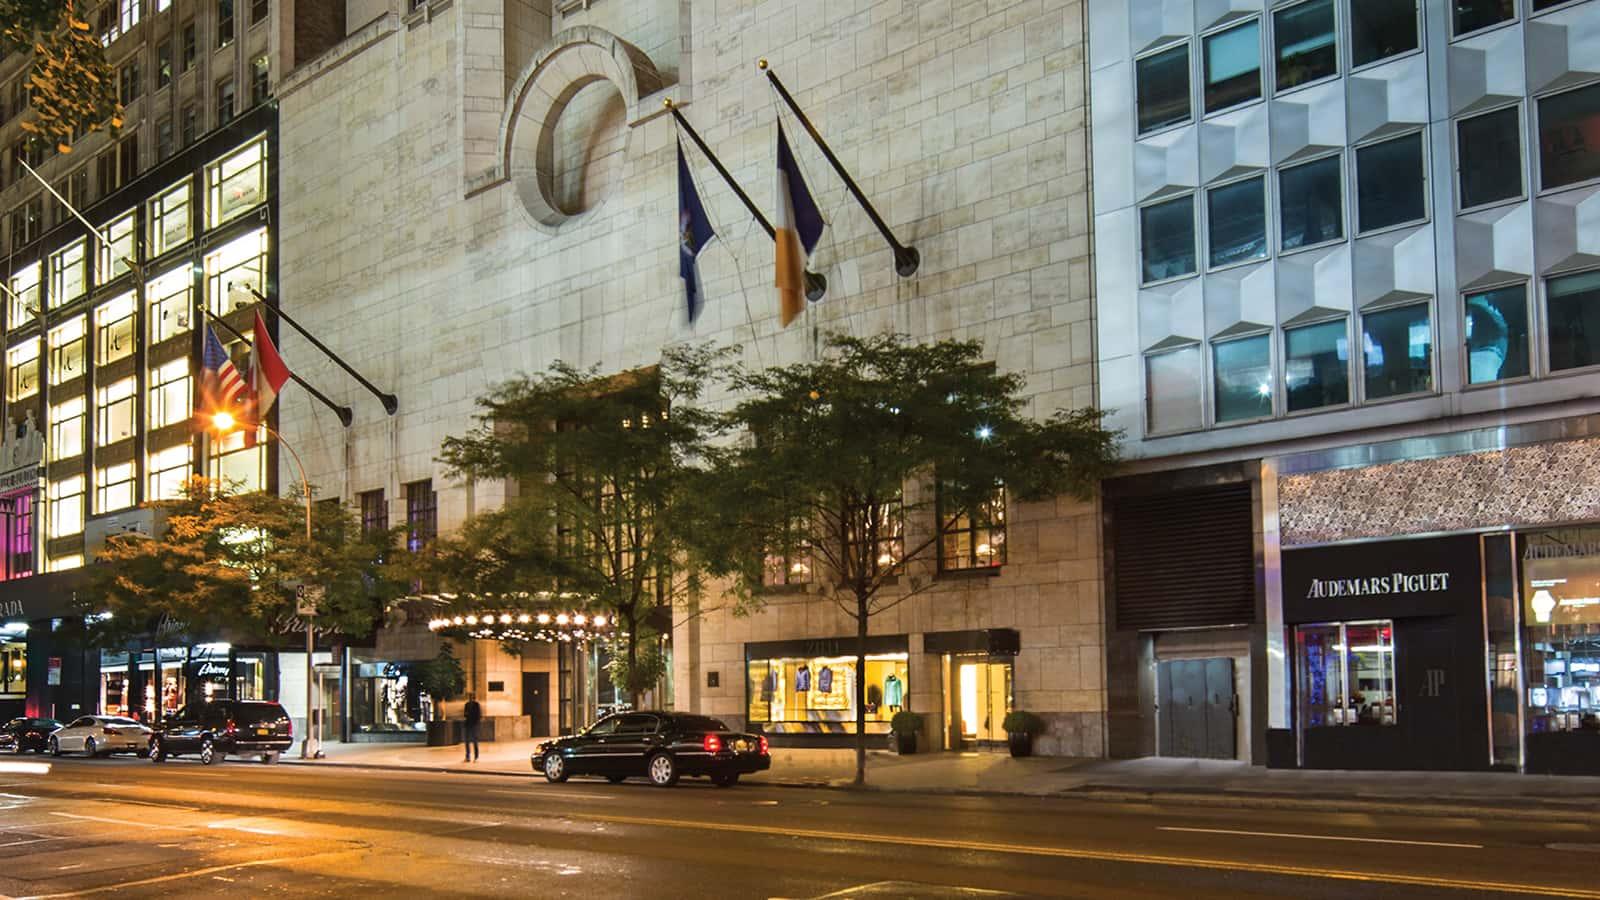 Luxury Hotels Nyc 5 Star Hotel Four Seasons New York Clope Org